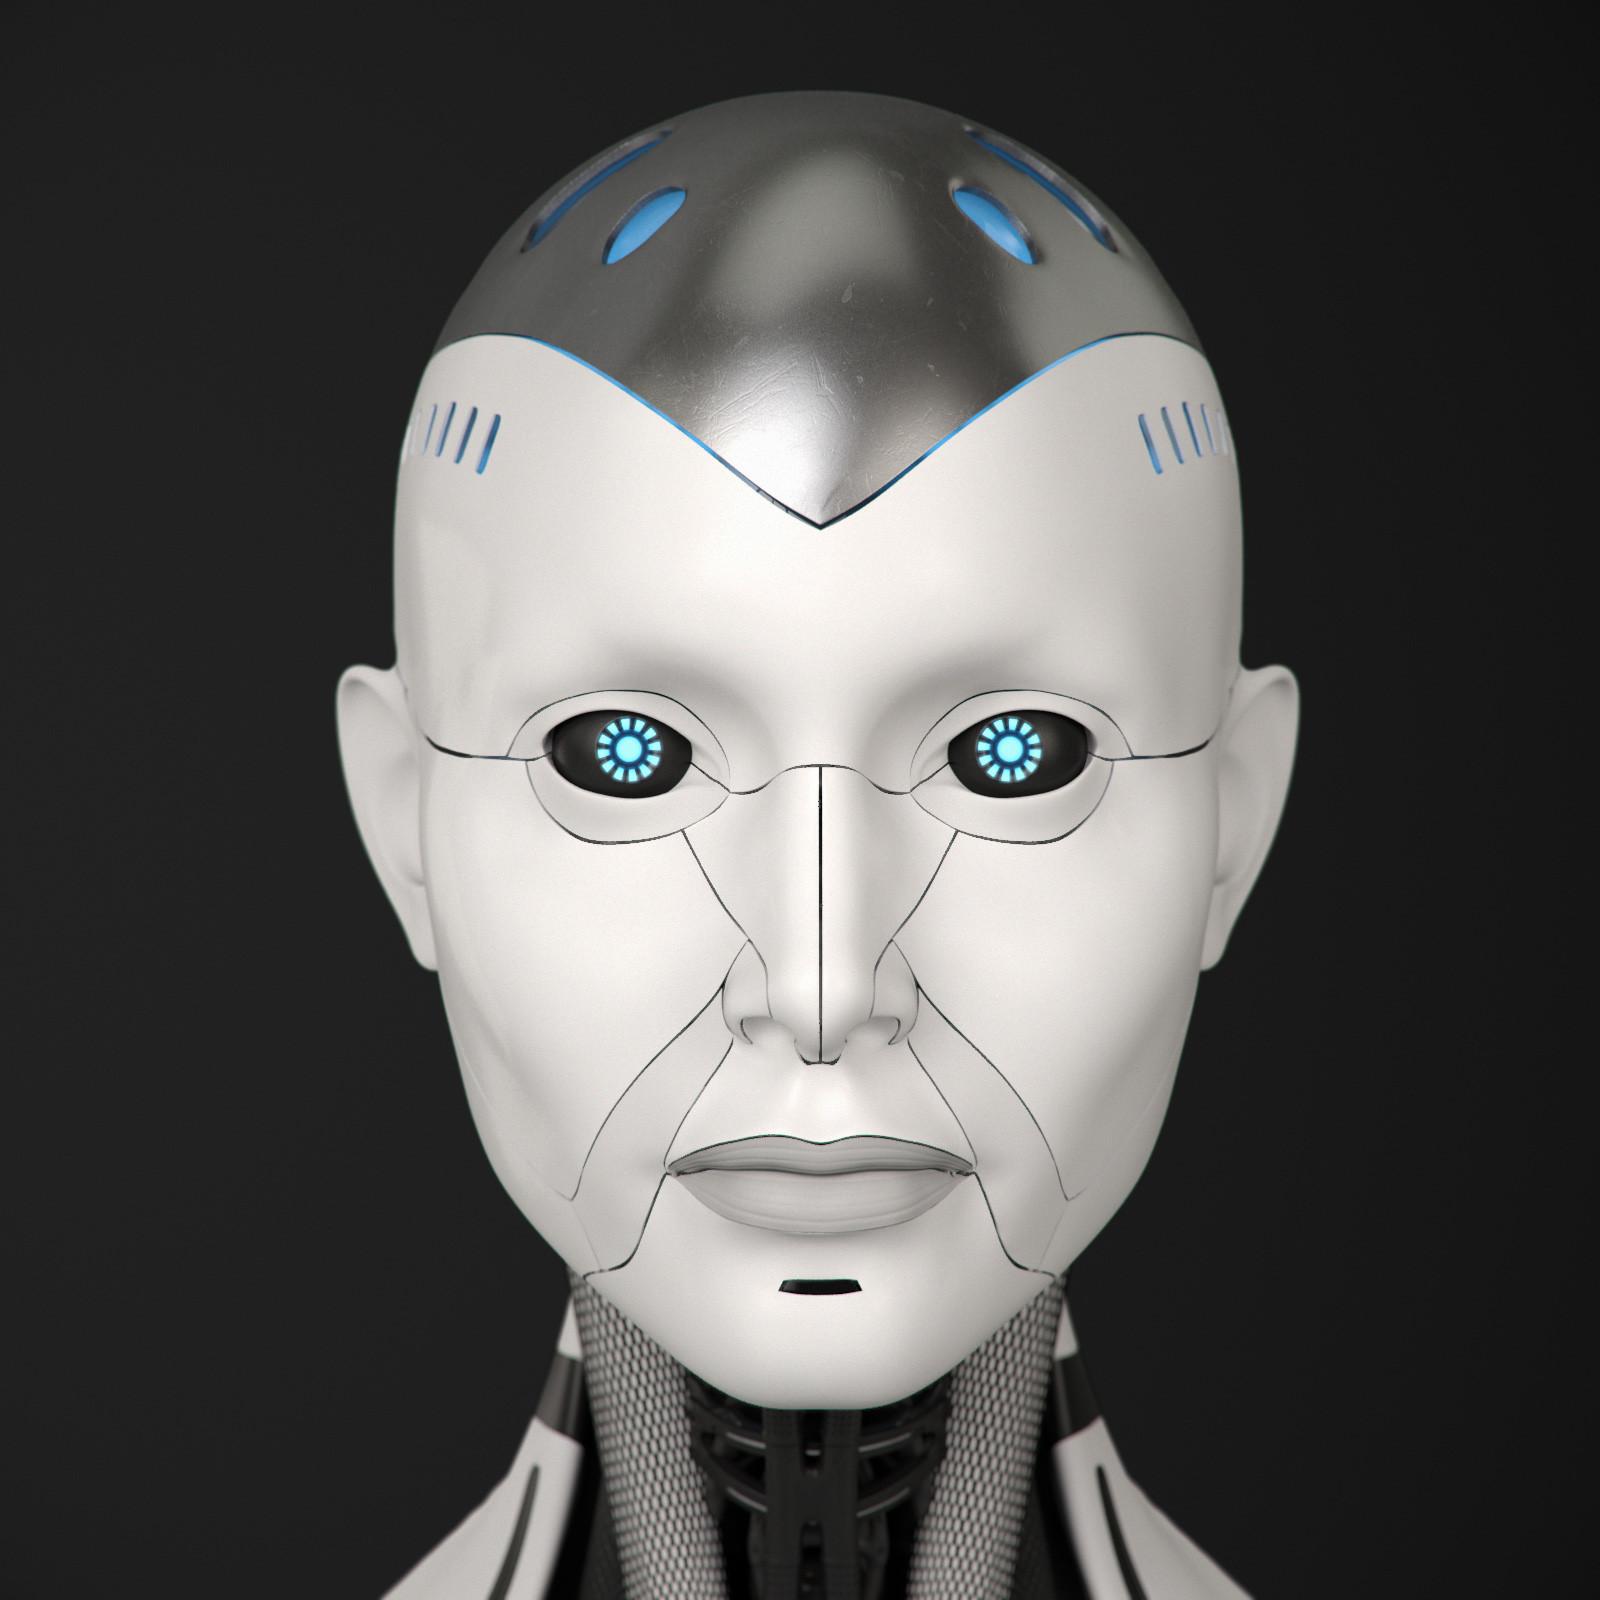 Cgmonkeyking dvc face cyborg00 pn01 pp01 front